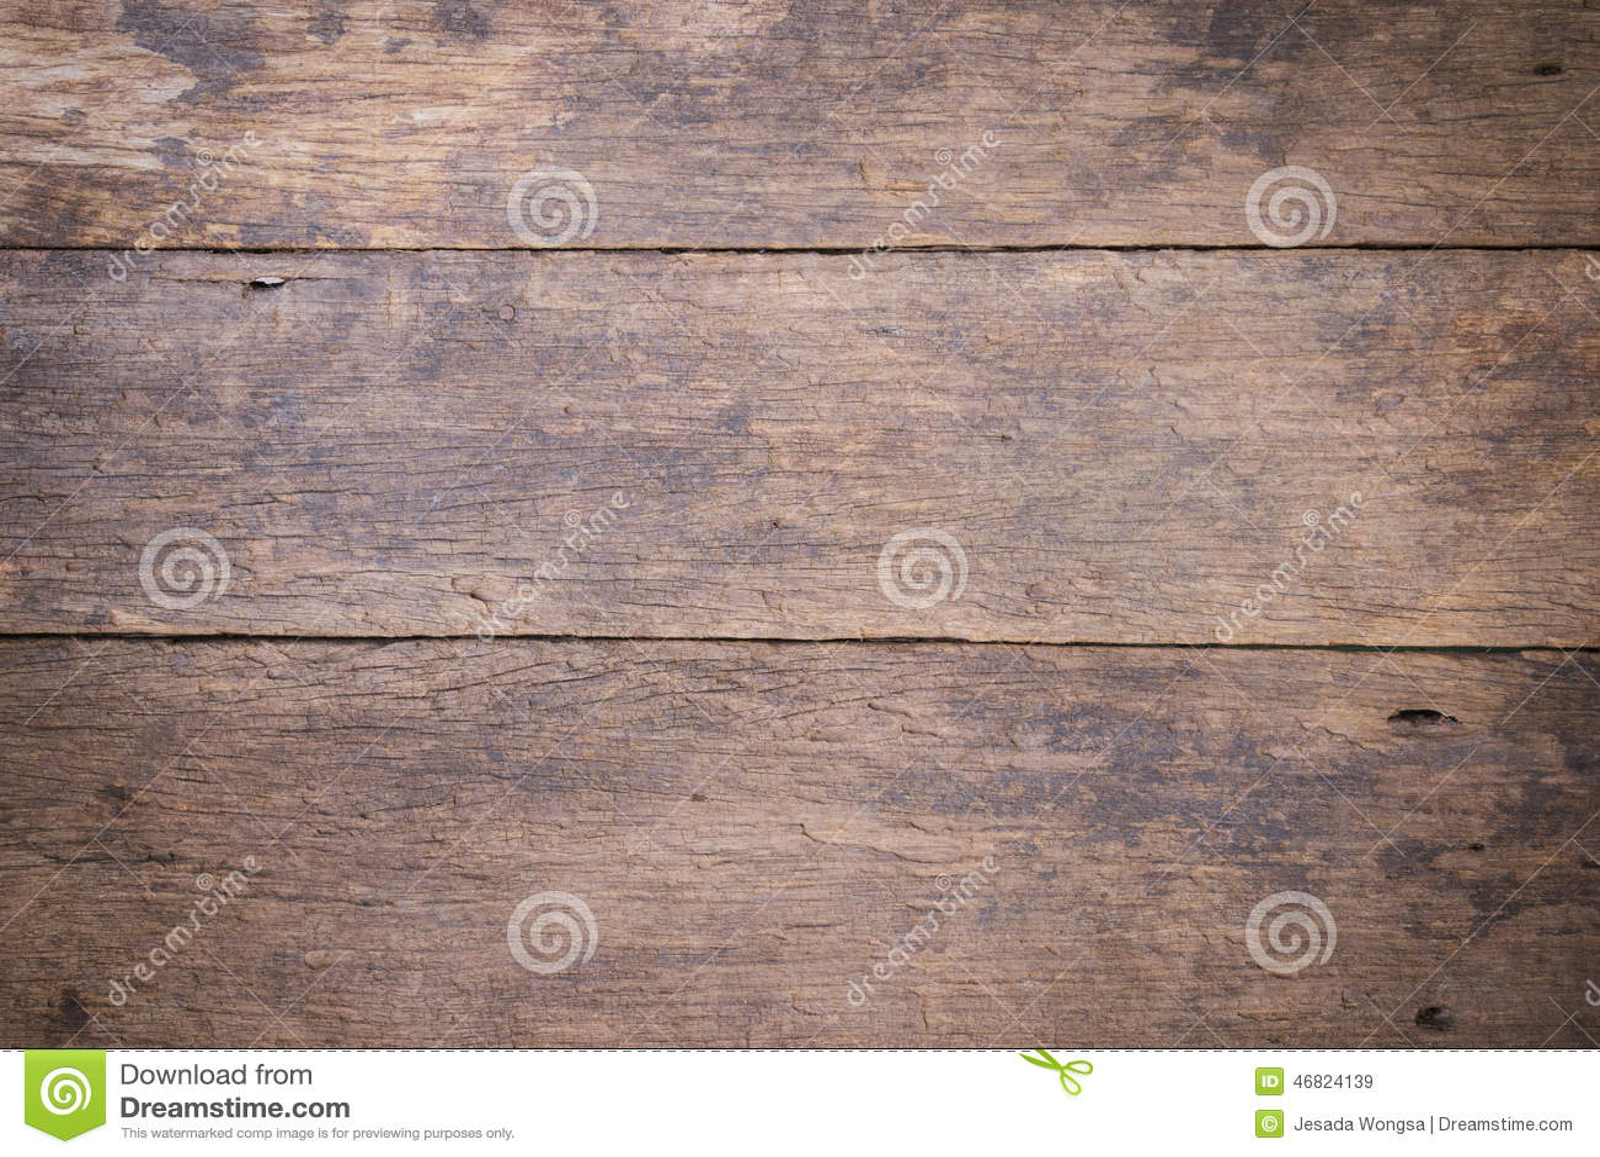 Hölzerner Fußbodenbelag ~ Alter hölzerner beschaffenheitshintergrund fußbodenbelag stockbild